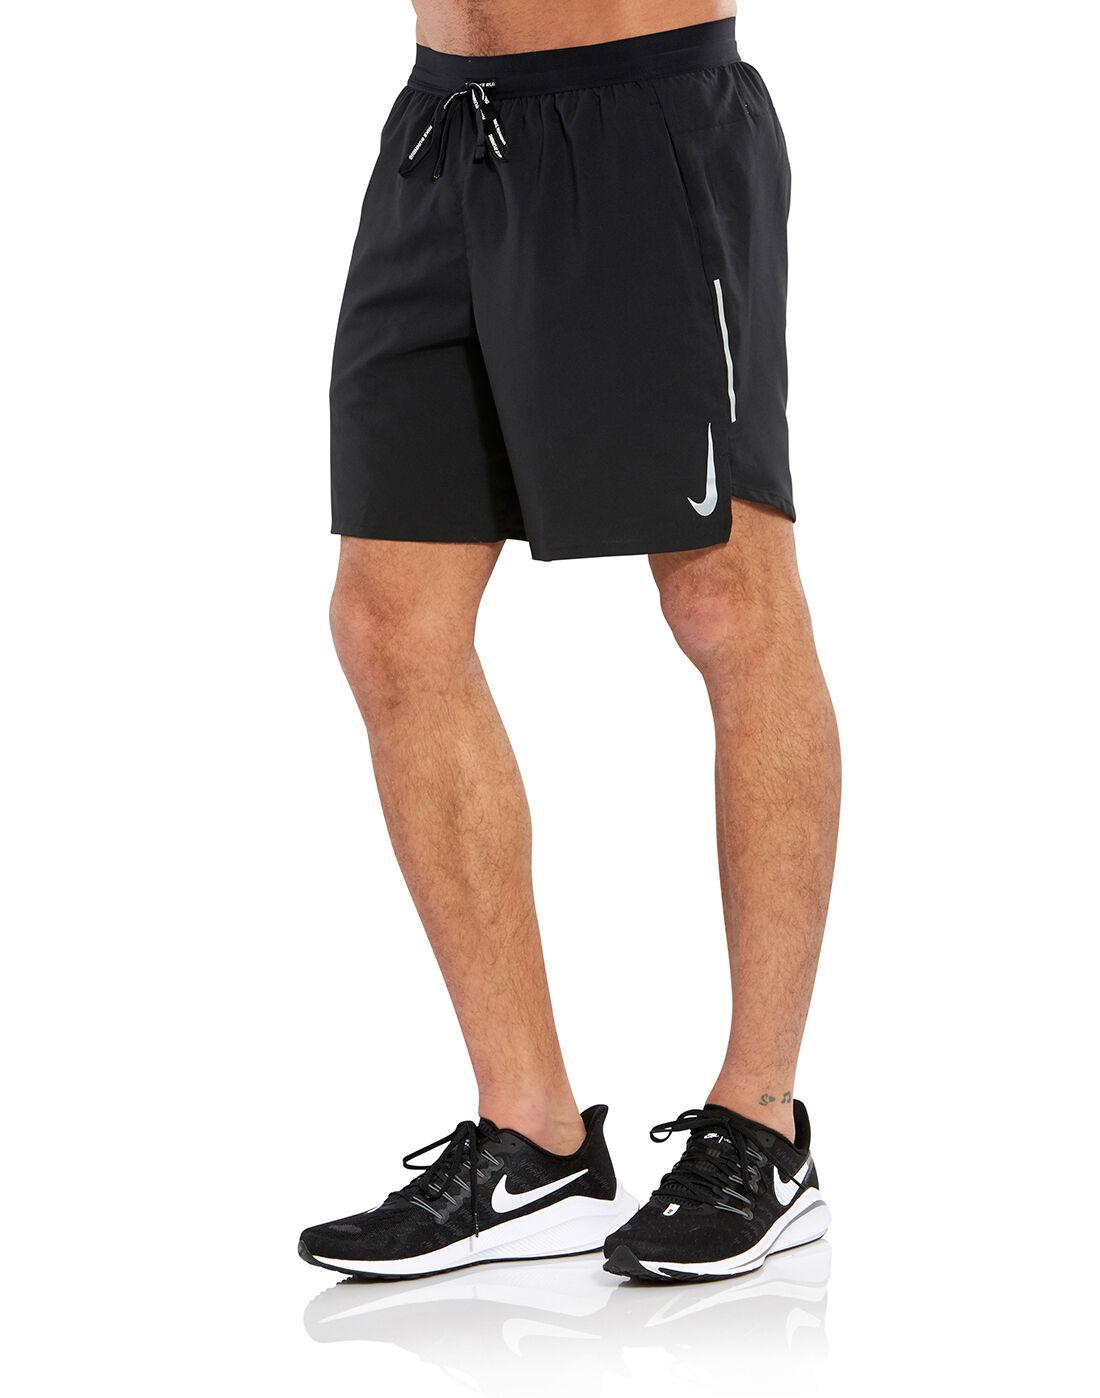 Nike Mens Flex Stride 7 Inch Shorts